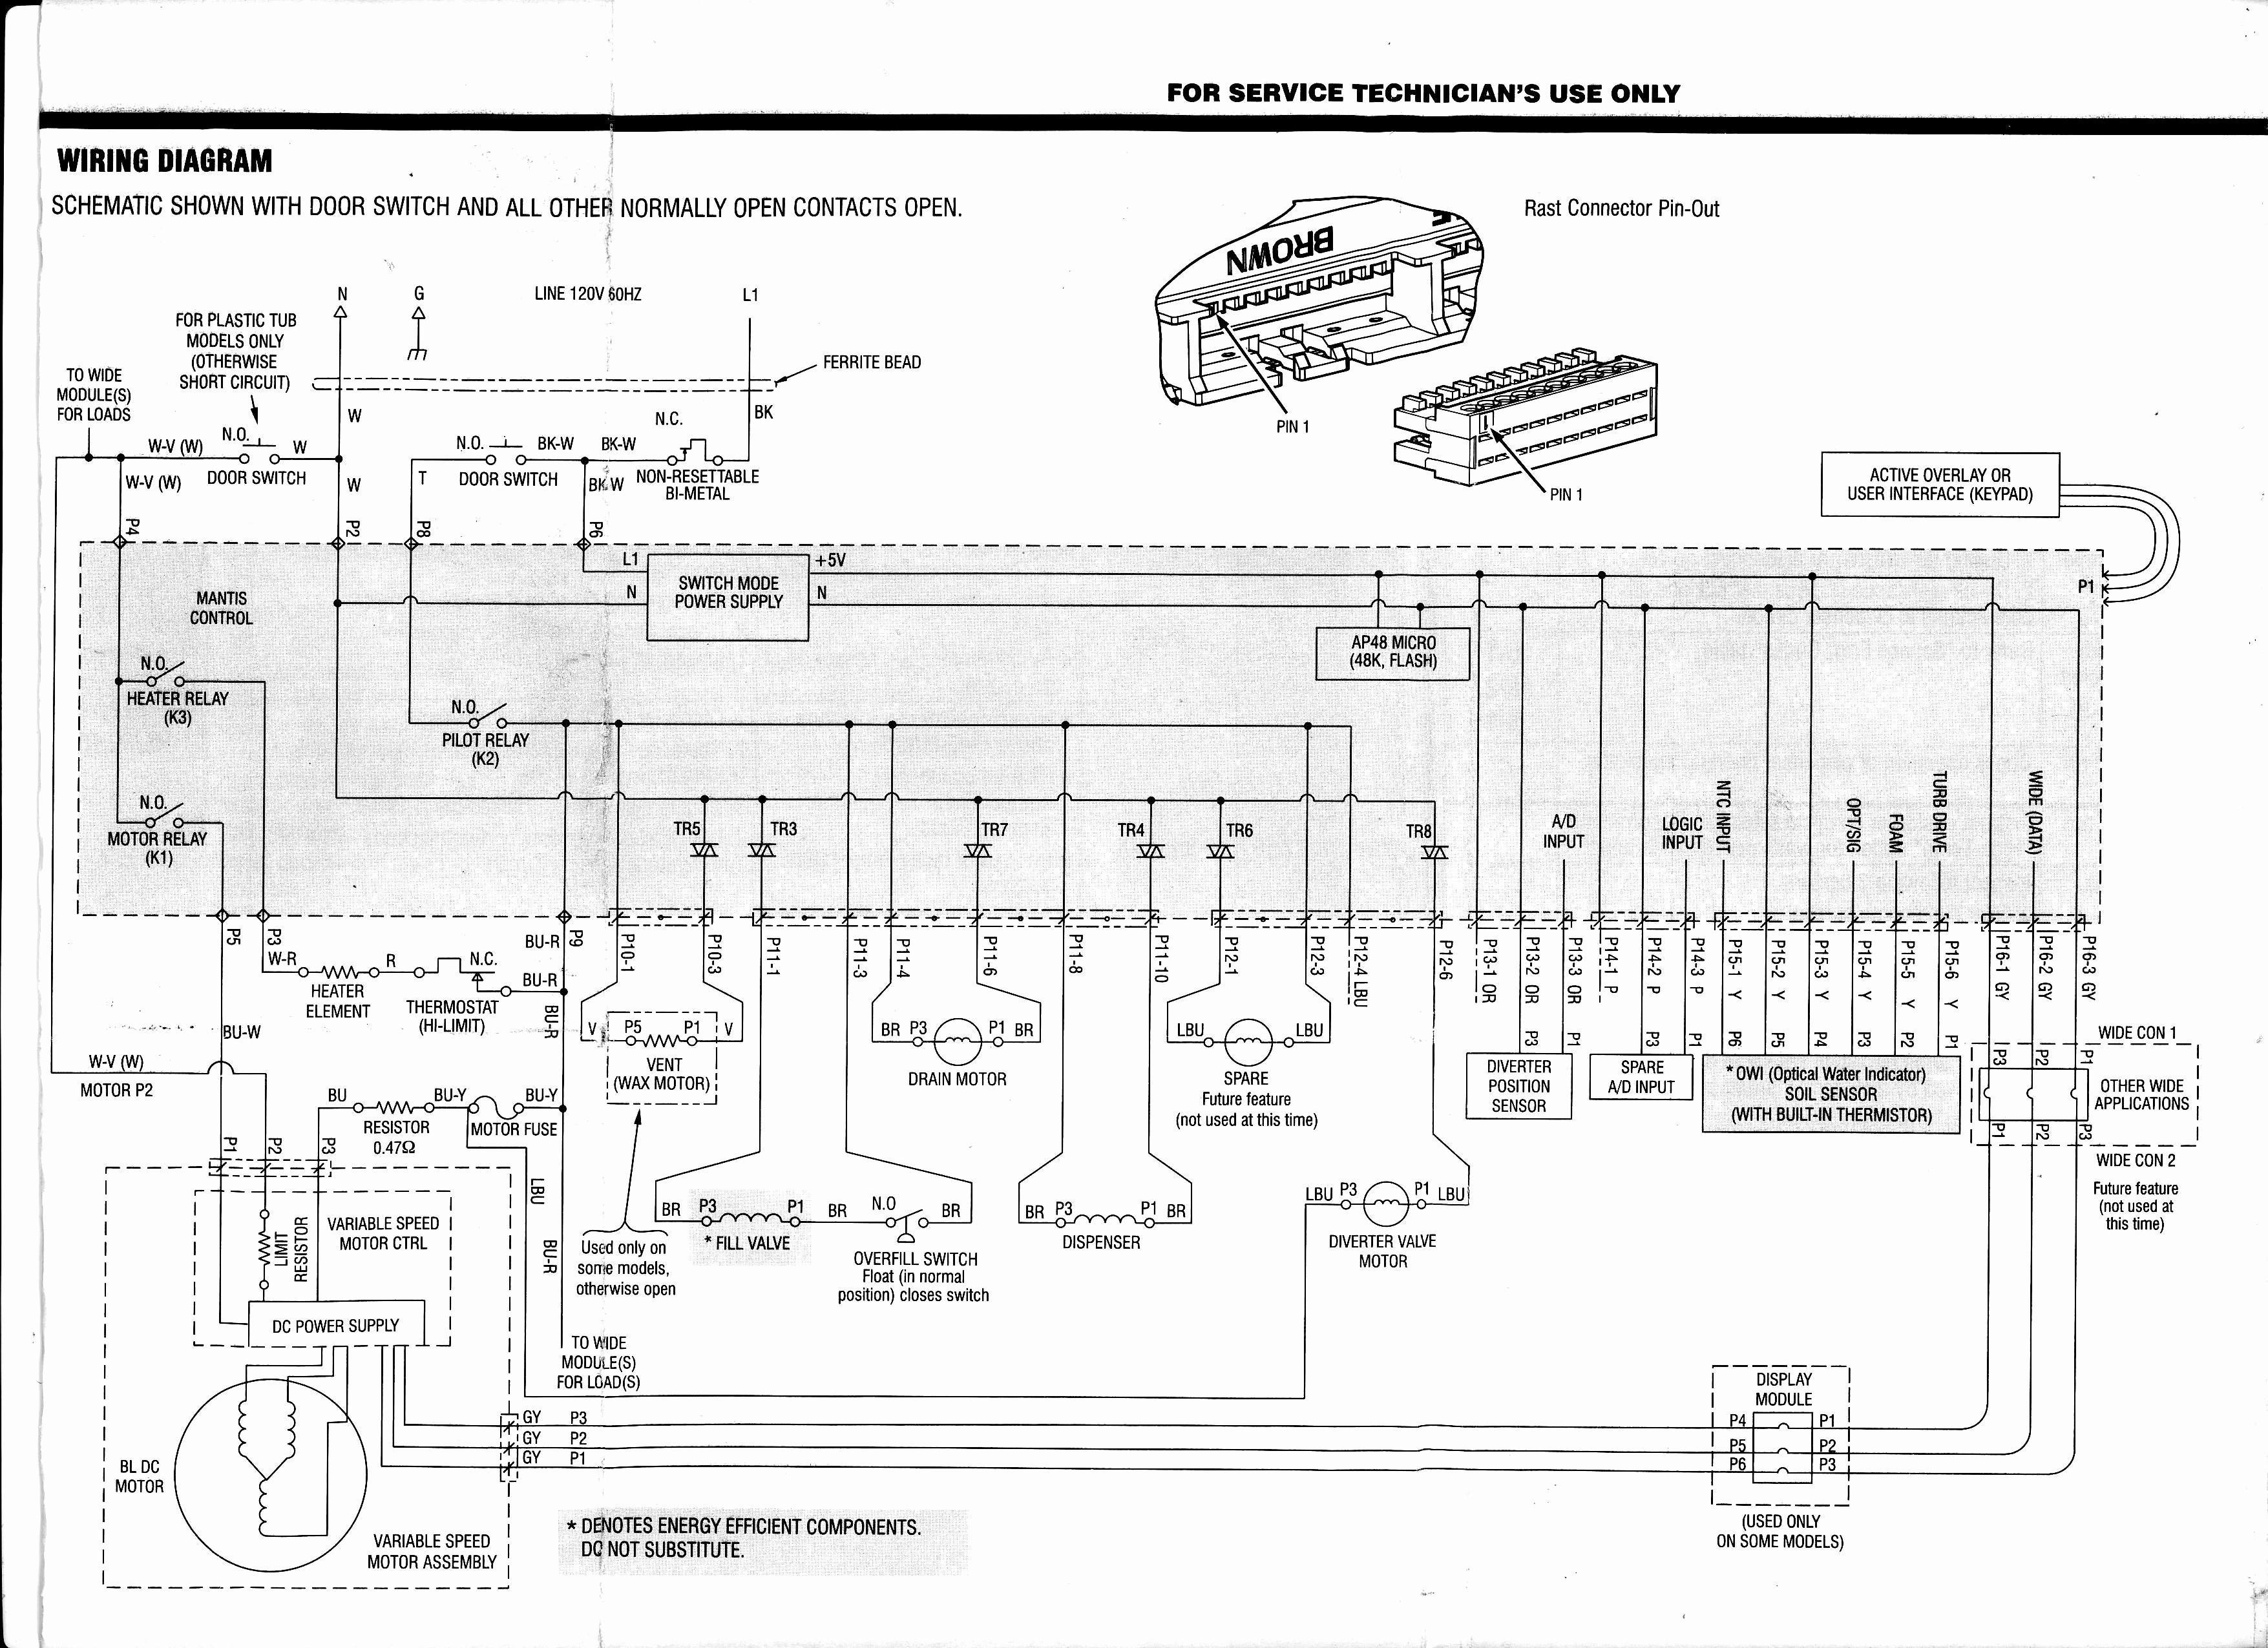 Full Size of Wiring Diagram Kenmore Elite Refrigerator Wiring Diagram New Wiring Diagram For Kenmore